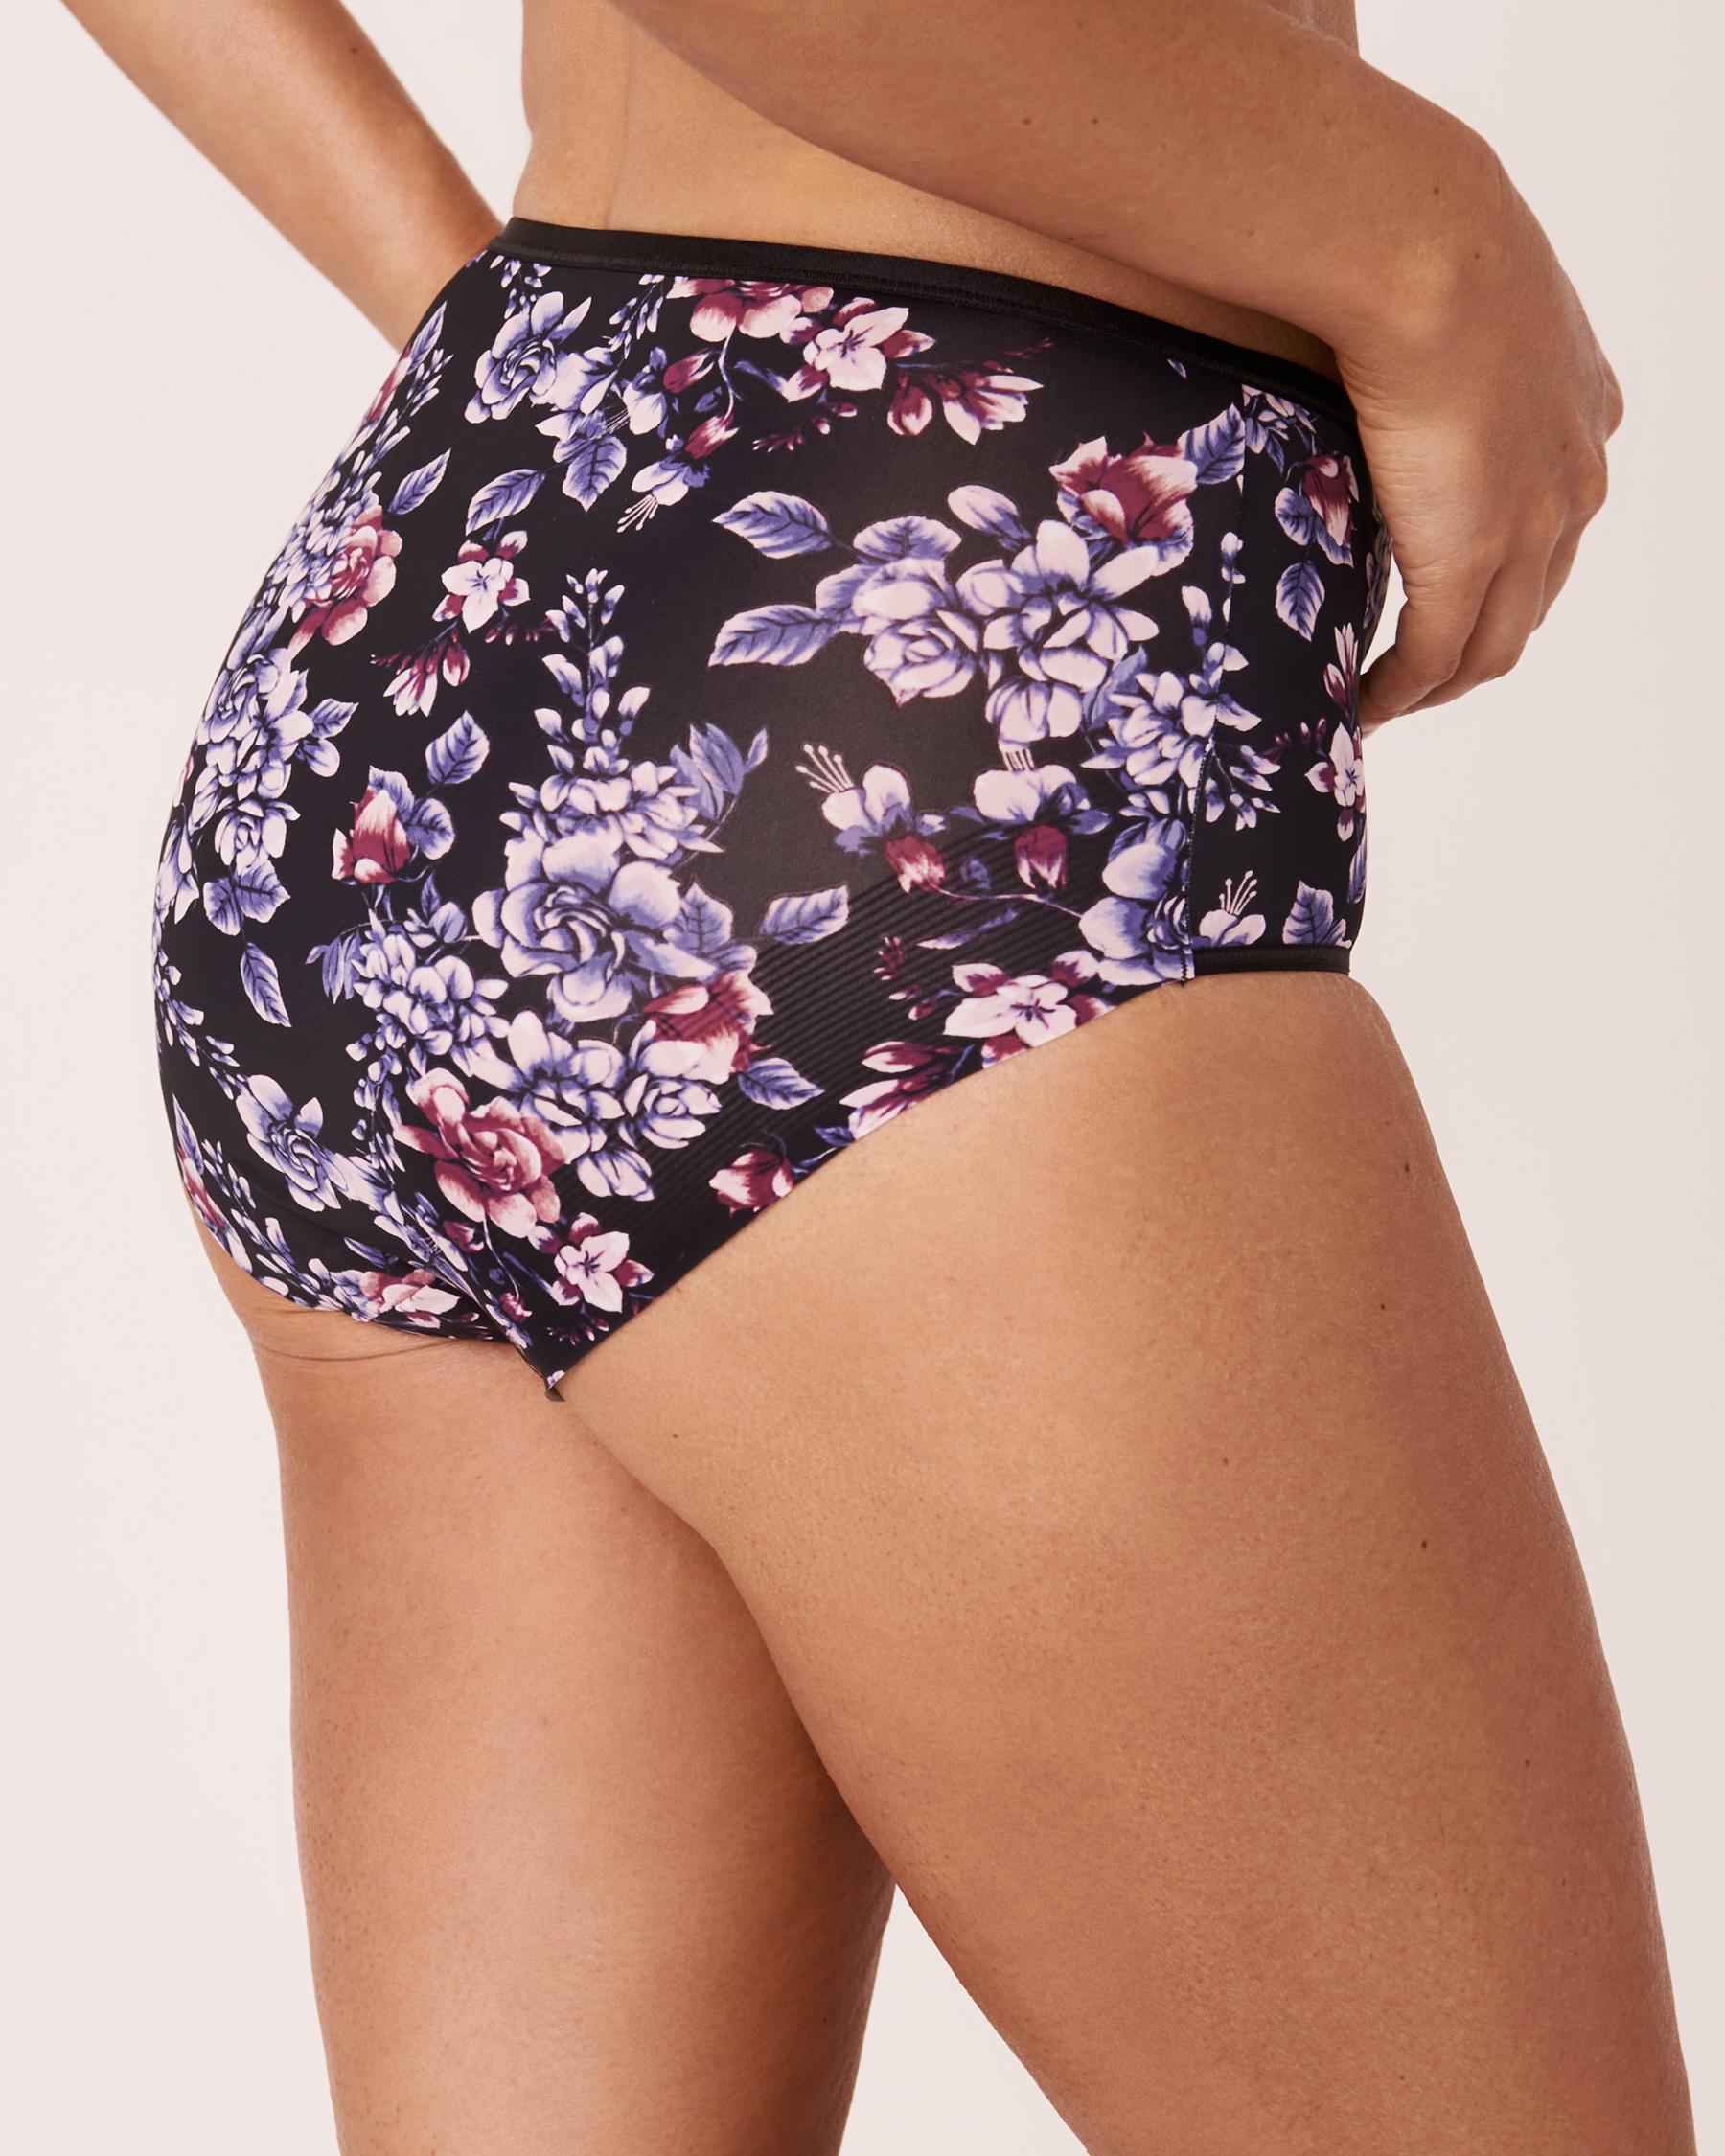 LA VIE EN ROSE High Waist Bikini Panty Watercolor florals 20300049 - View5